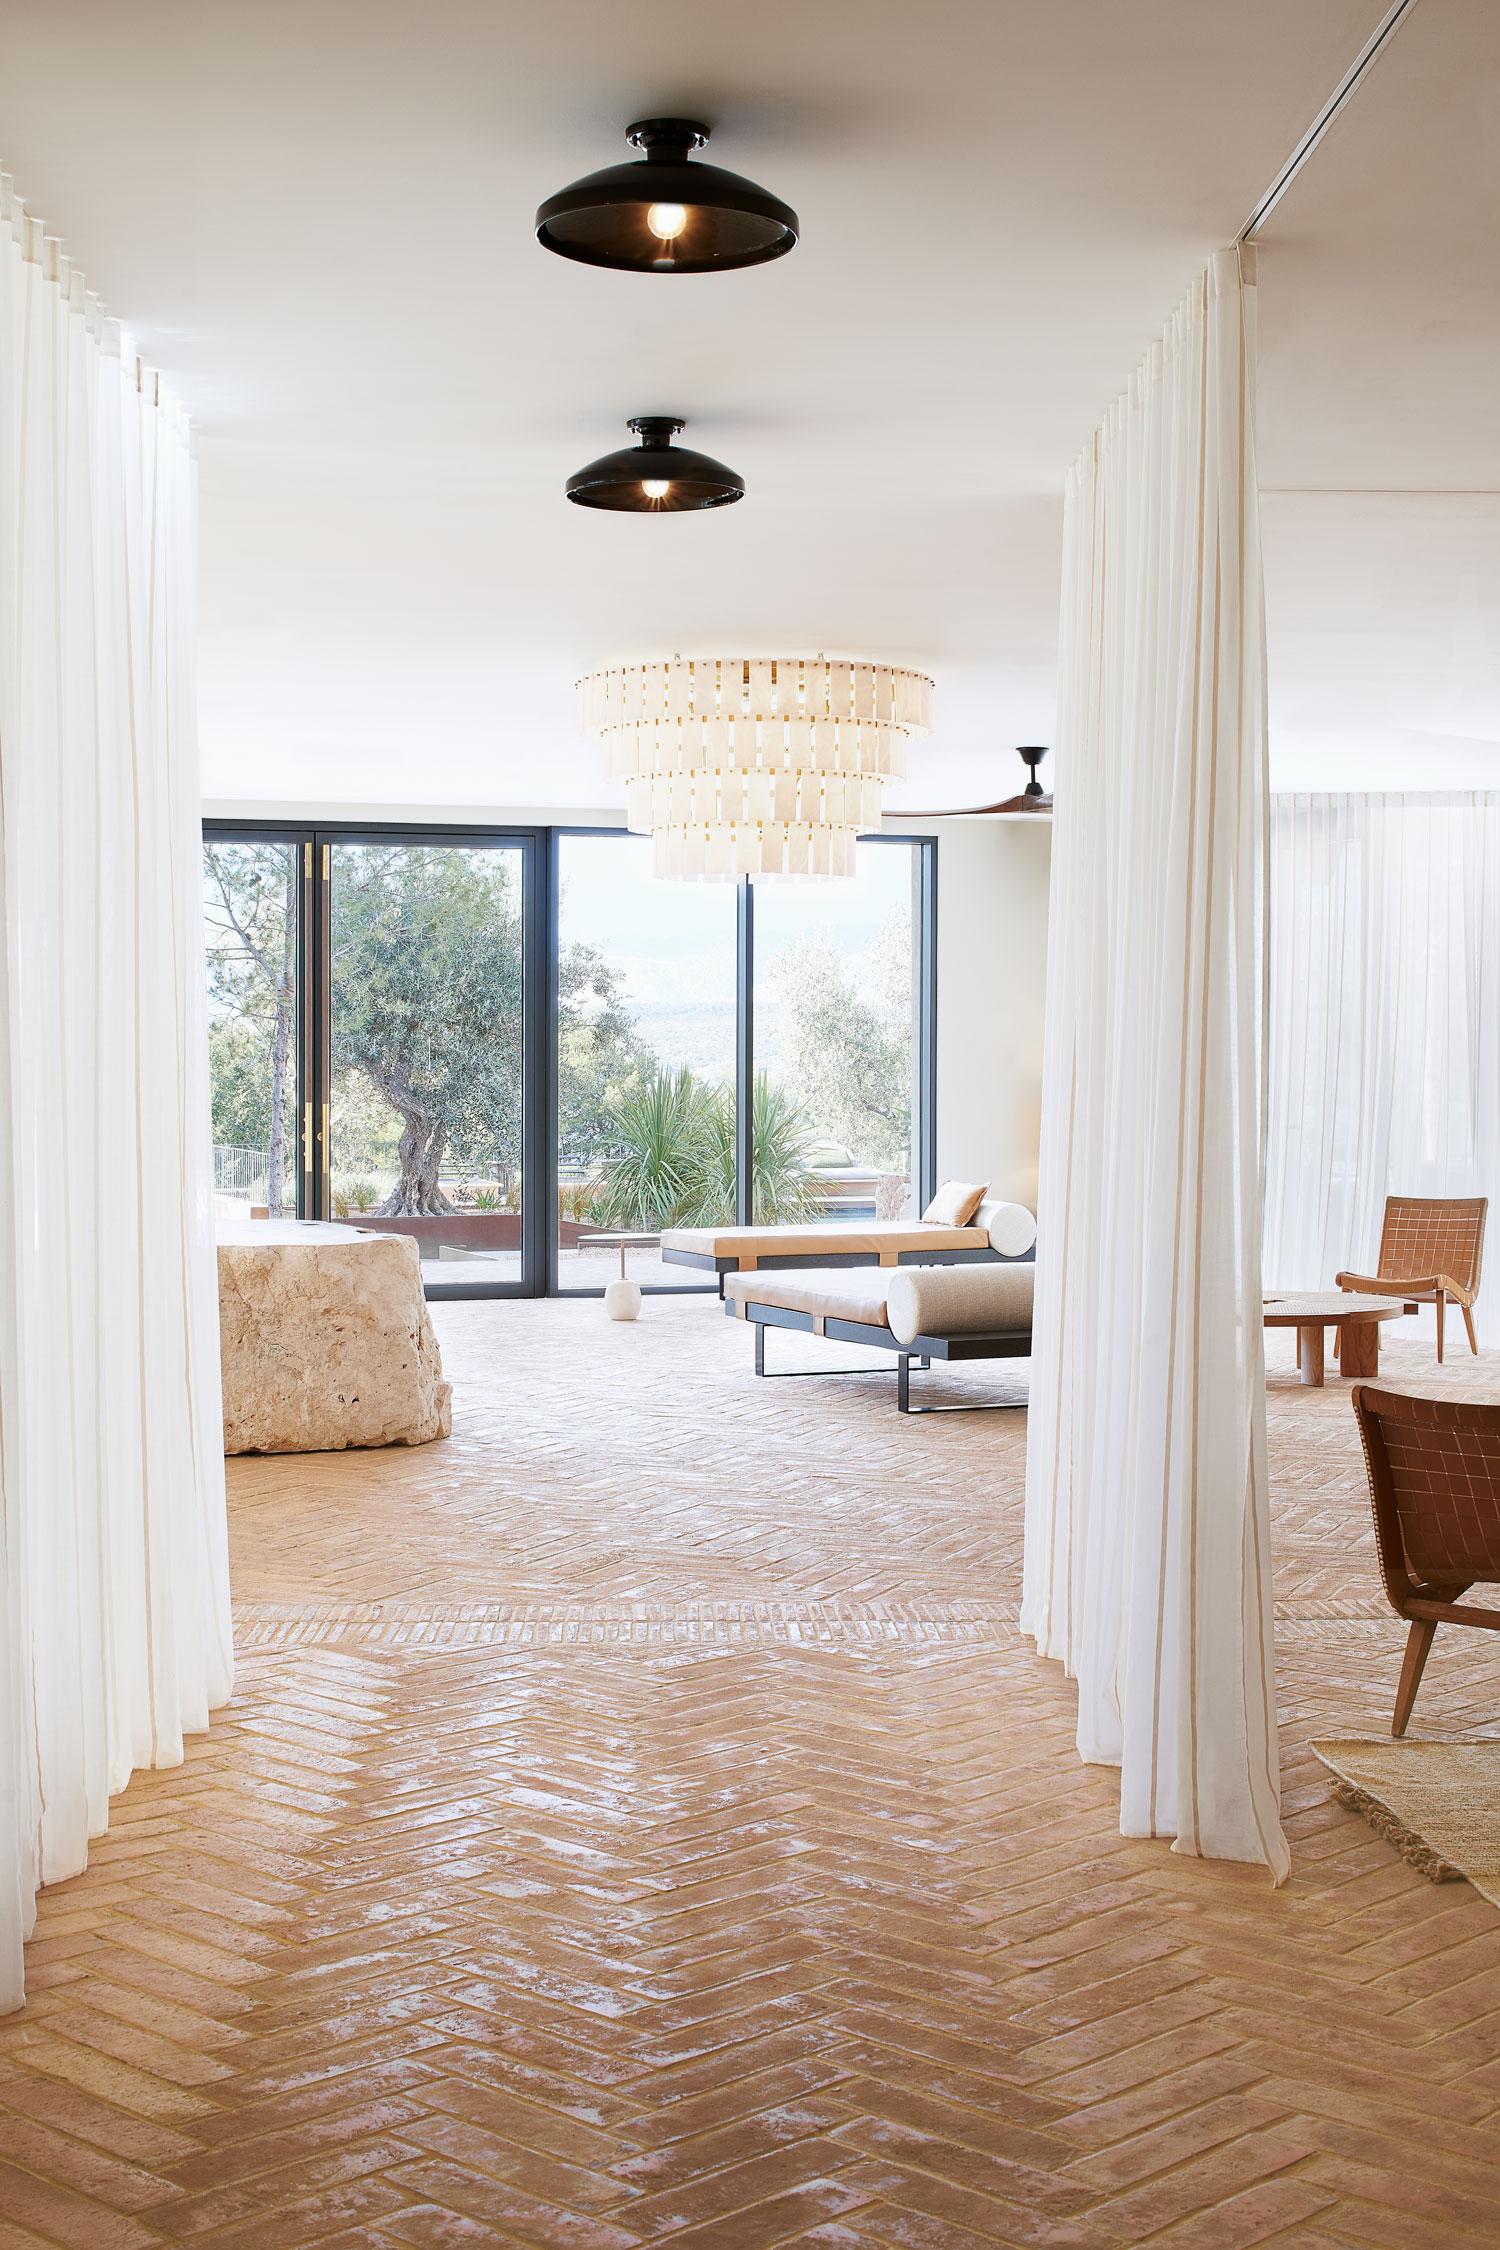 Lam Studio Hotel Maslina Hvar Croatia Luxury Accommodatino Photo Claire Israel Yellowtrace 03